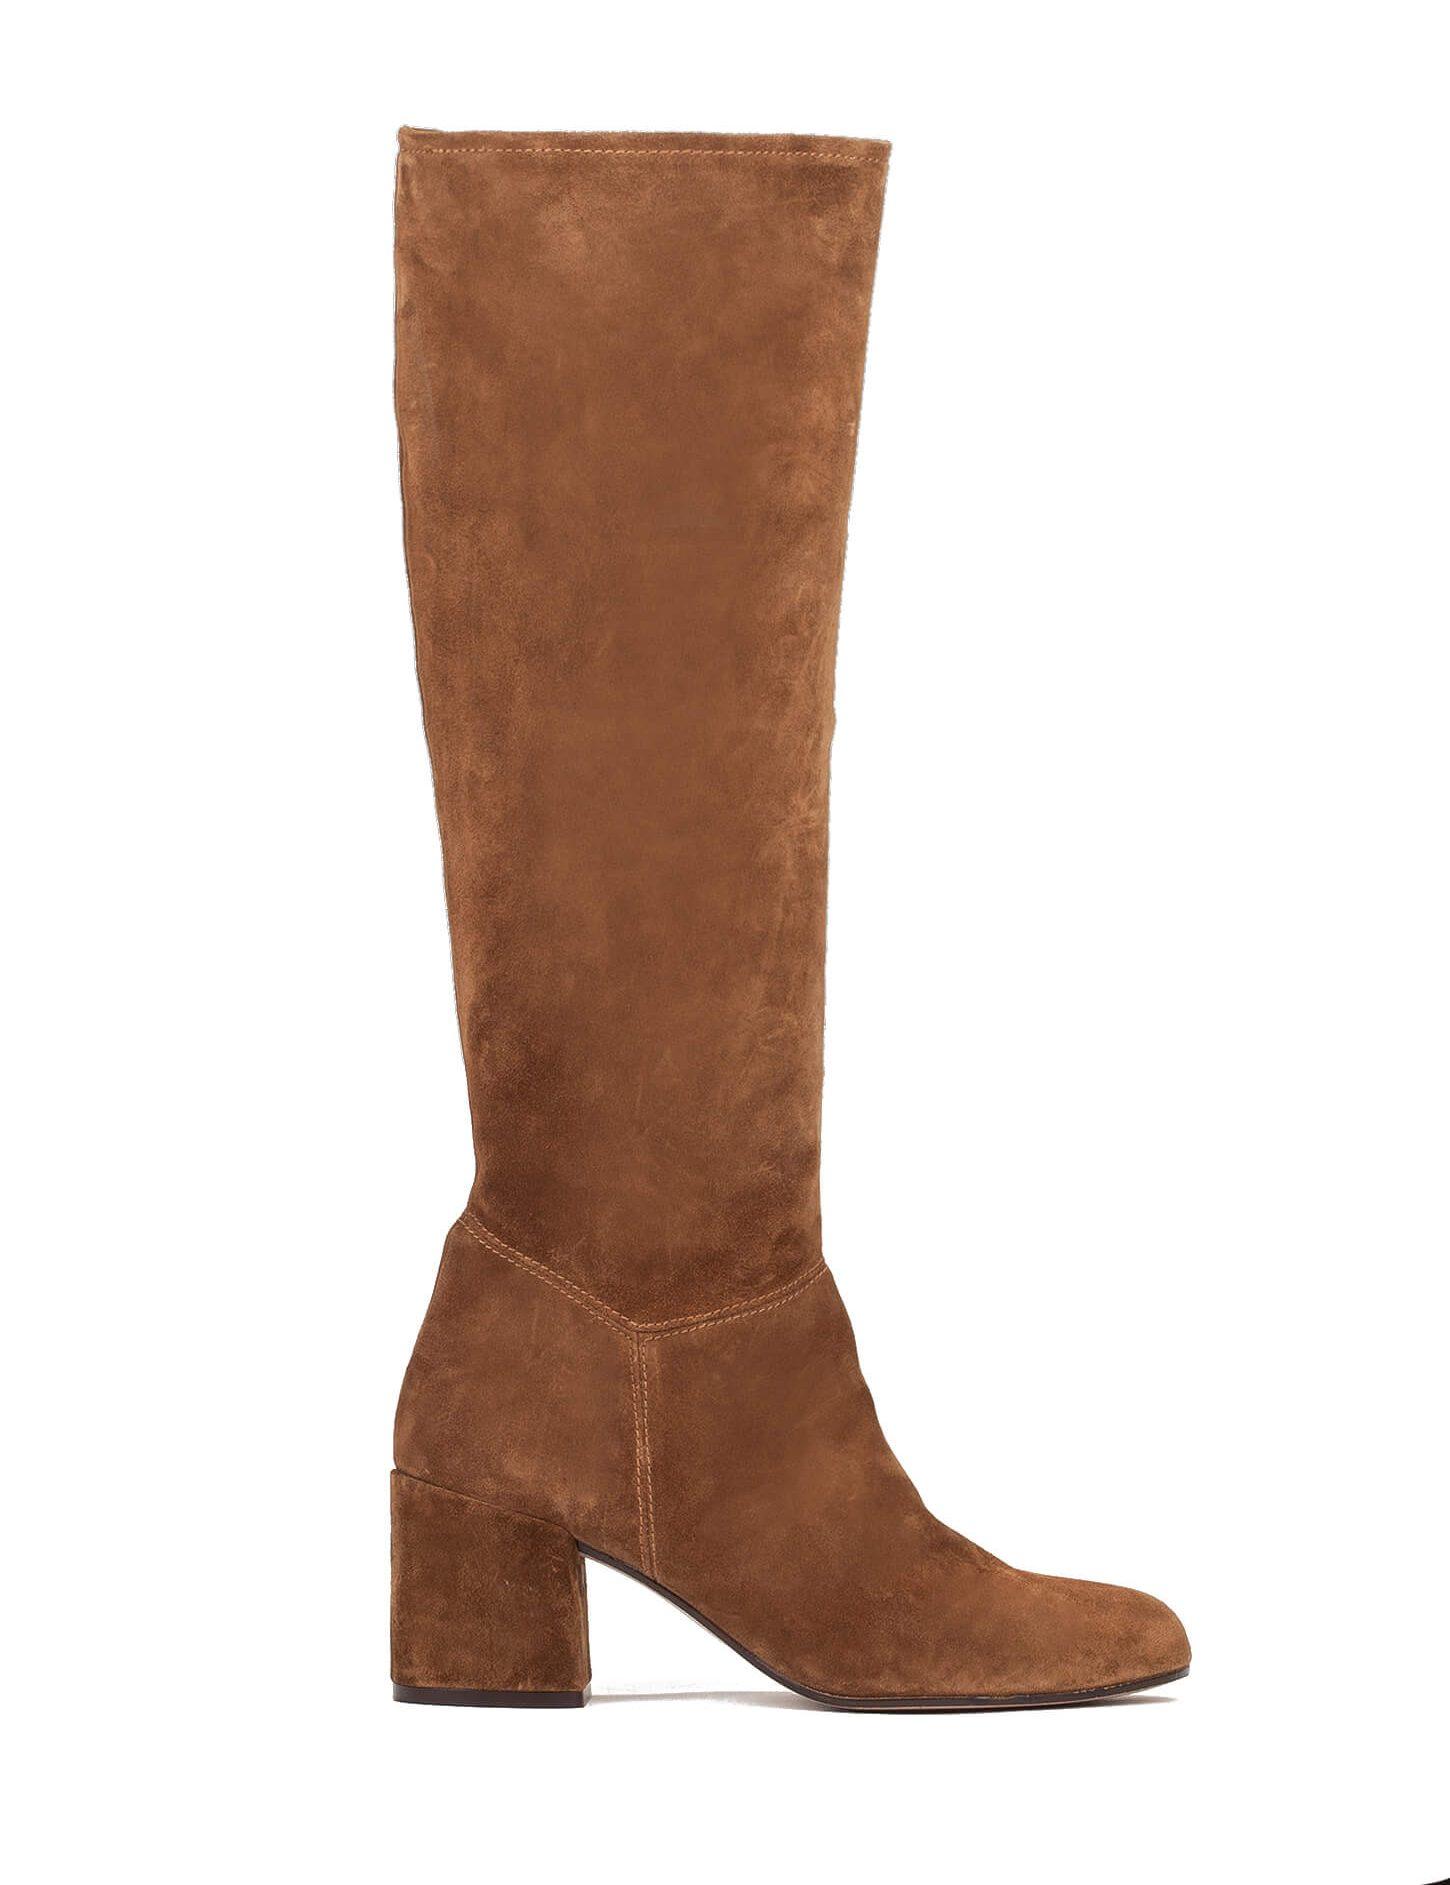 miriam giovanelli serie velvet outfit botas altas tacon ancho blog pura lopez